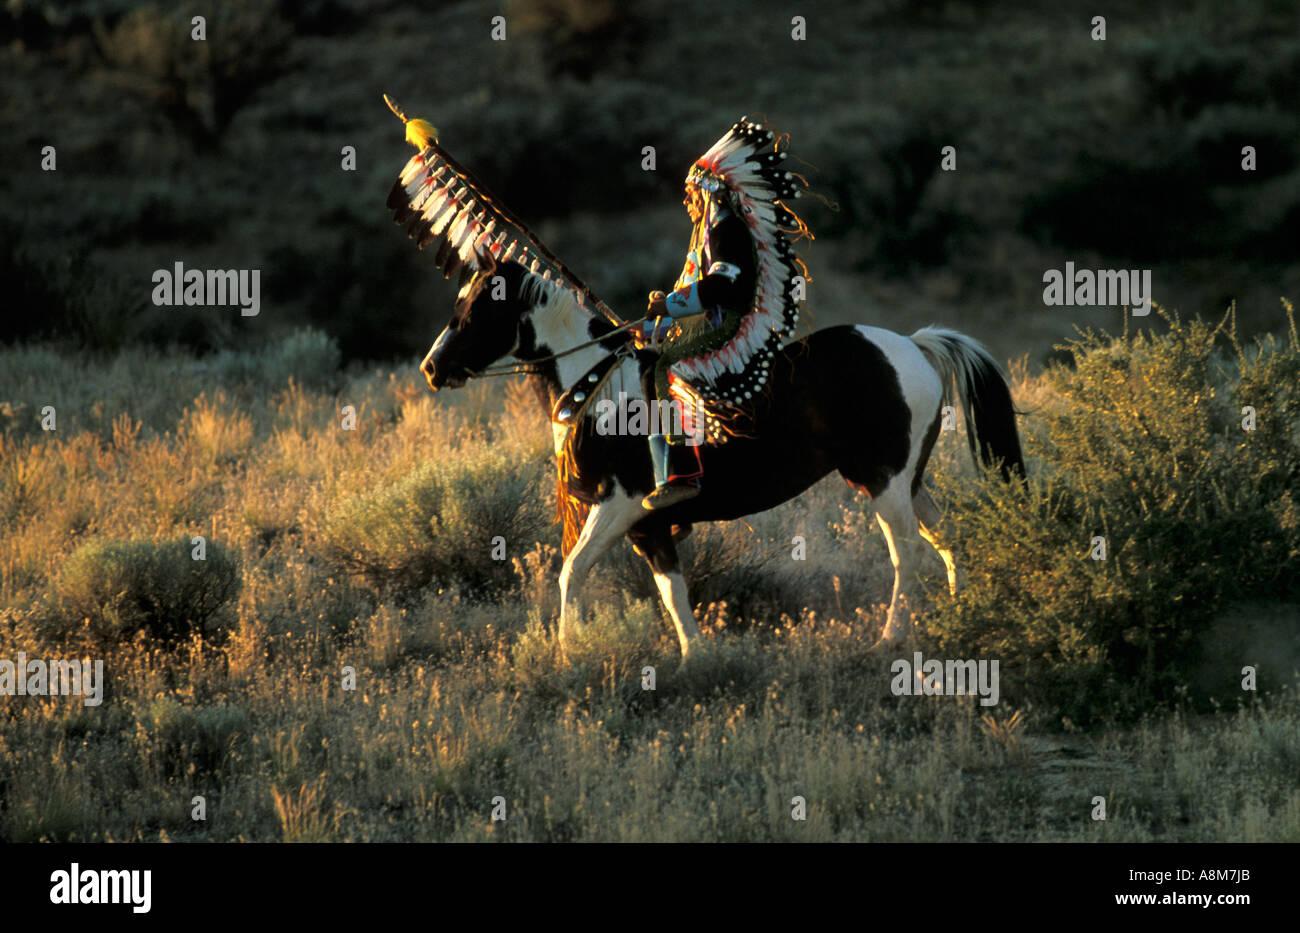 Usa Idaho Native American Indian Man In Tradtional Dress